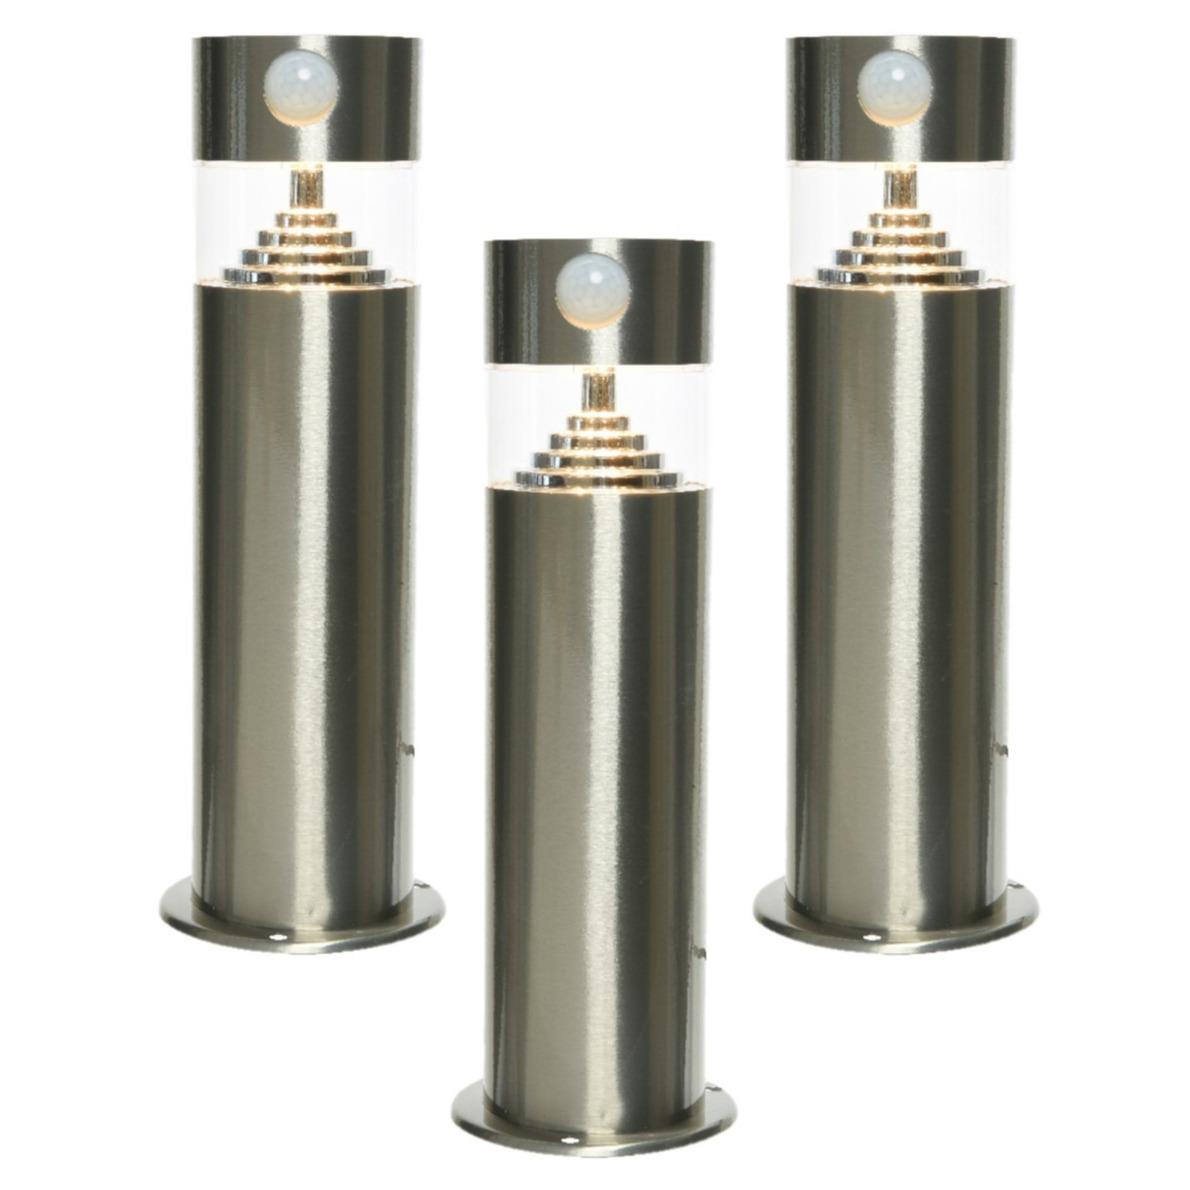 Set van 3x stuks solar tuinlamp/prikspot met bewegingssensor cilinder op zonne-energie 30 cm -